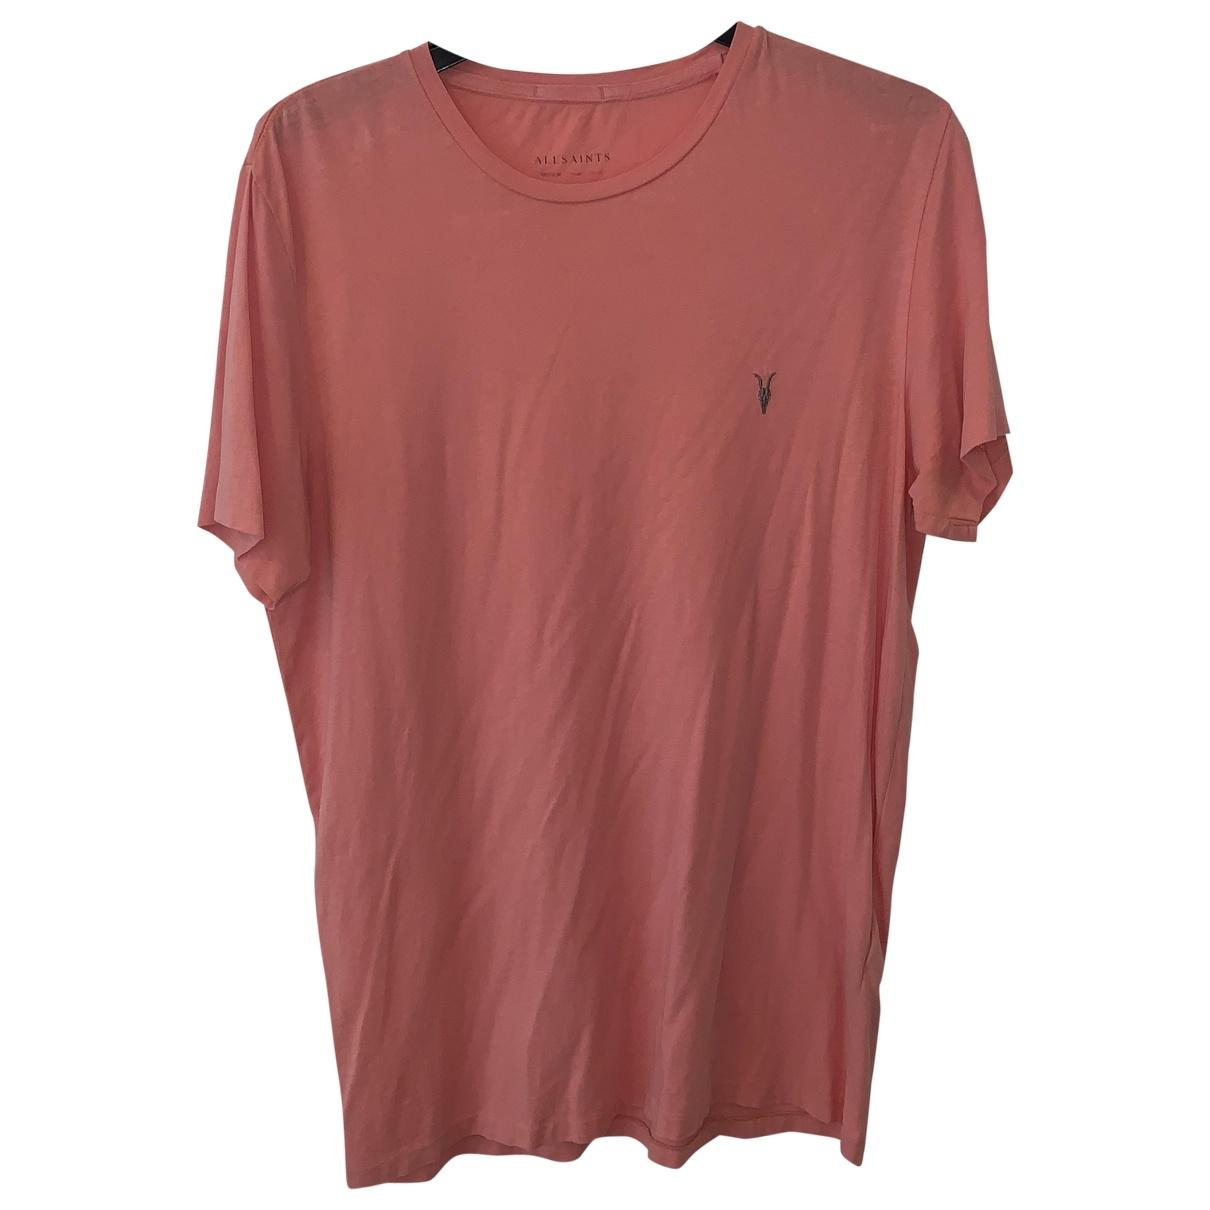 All Saints \N Cotton T-shirts for Men M International